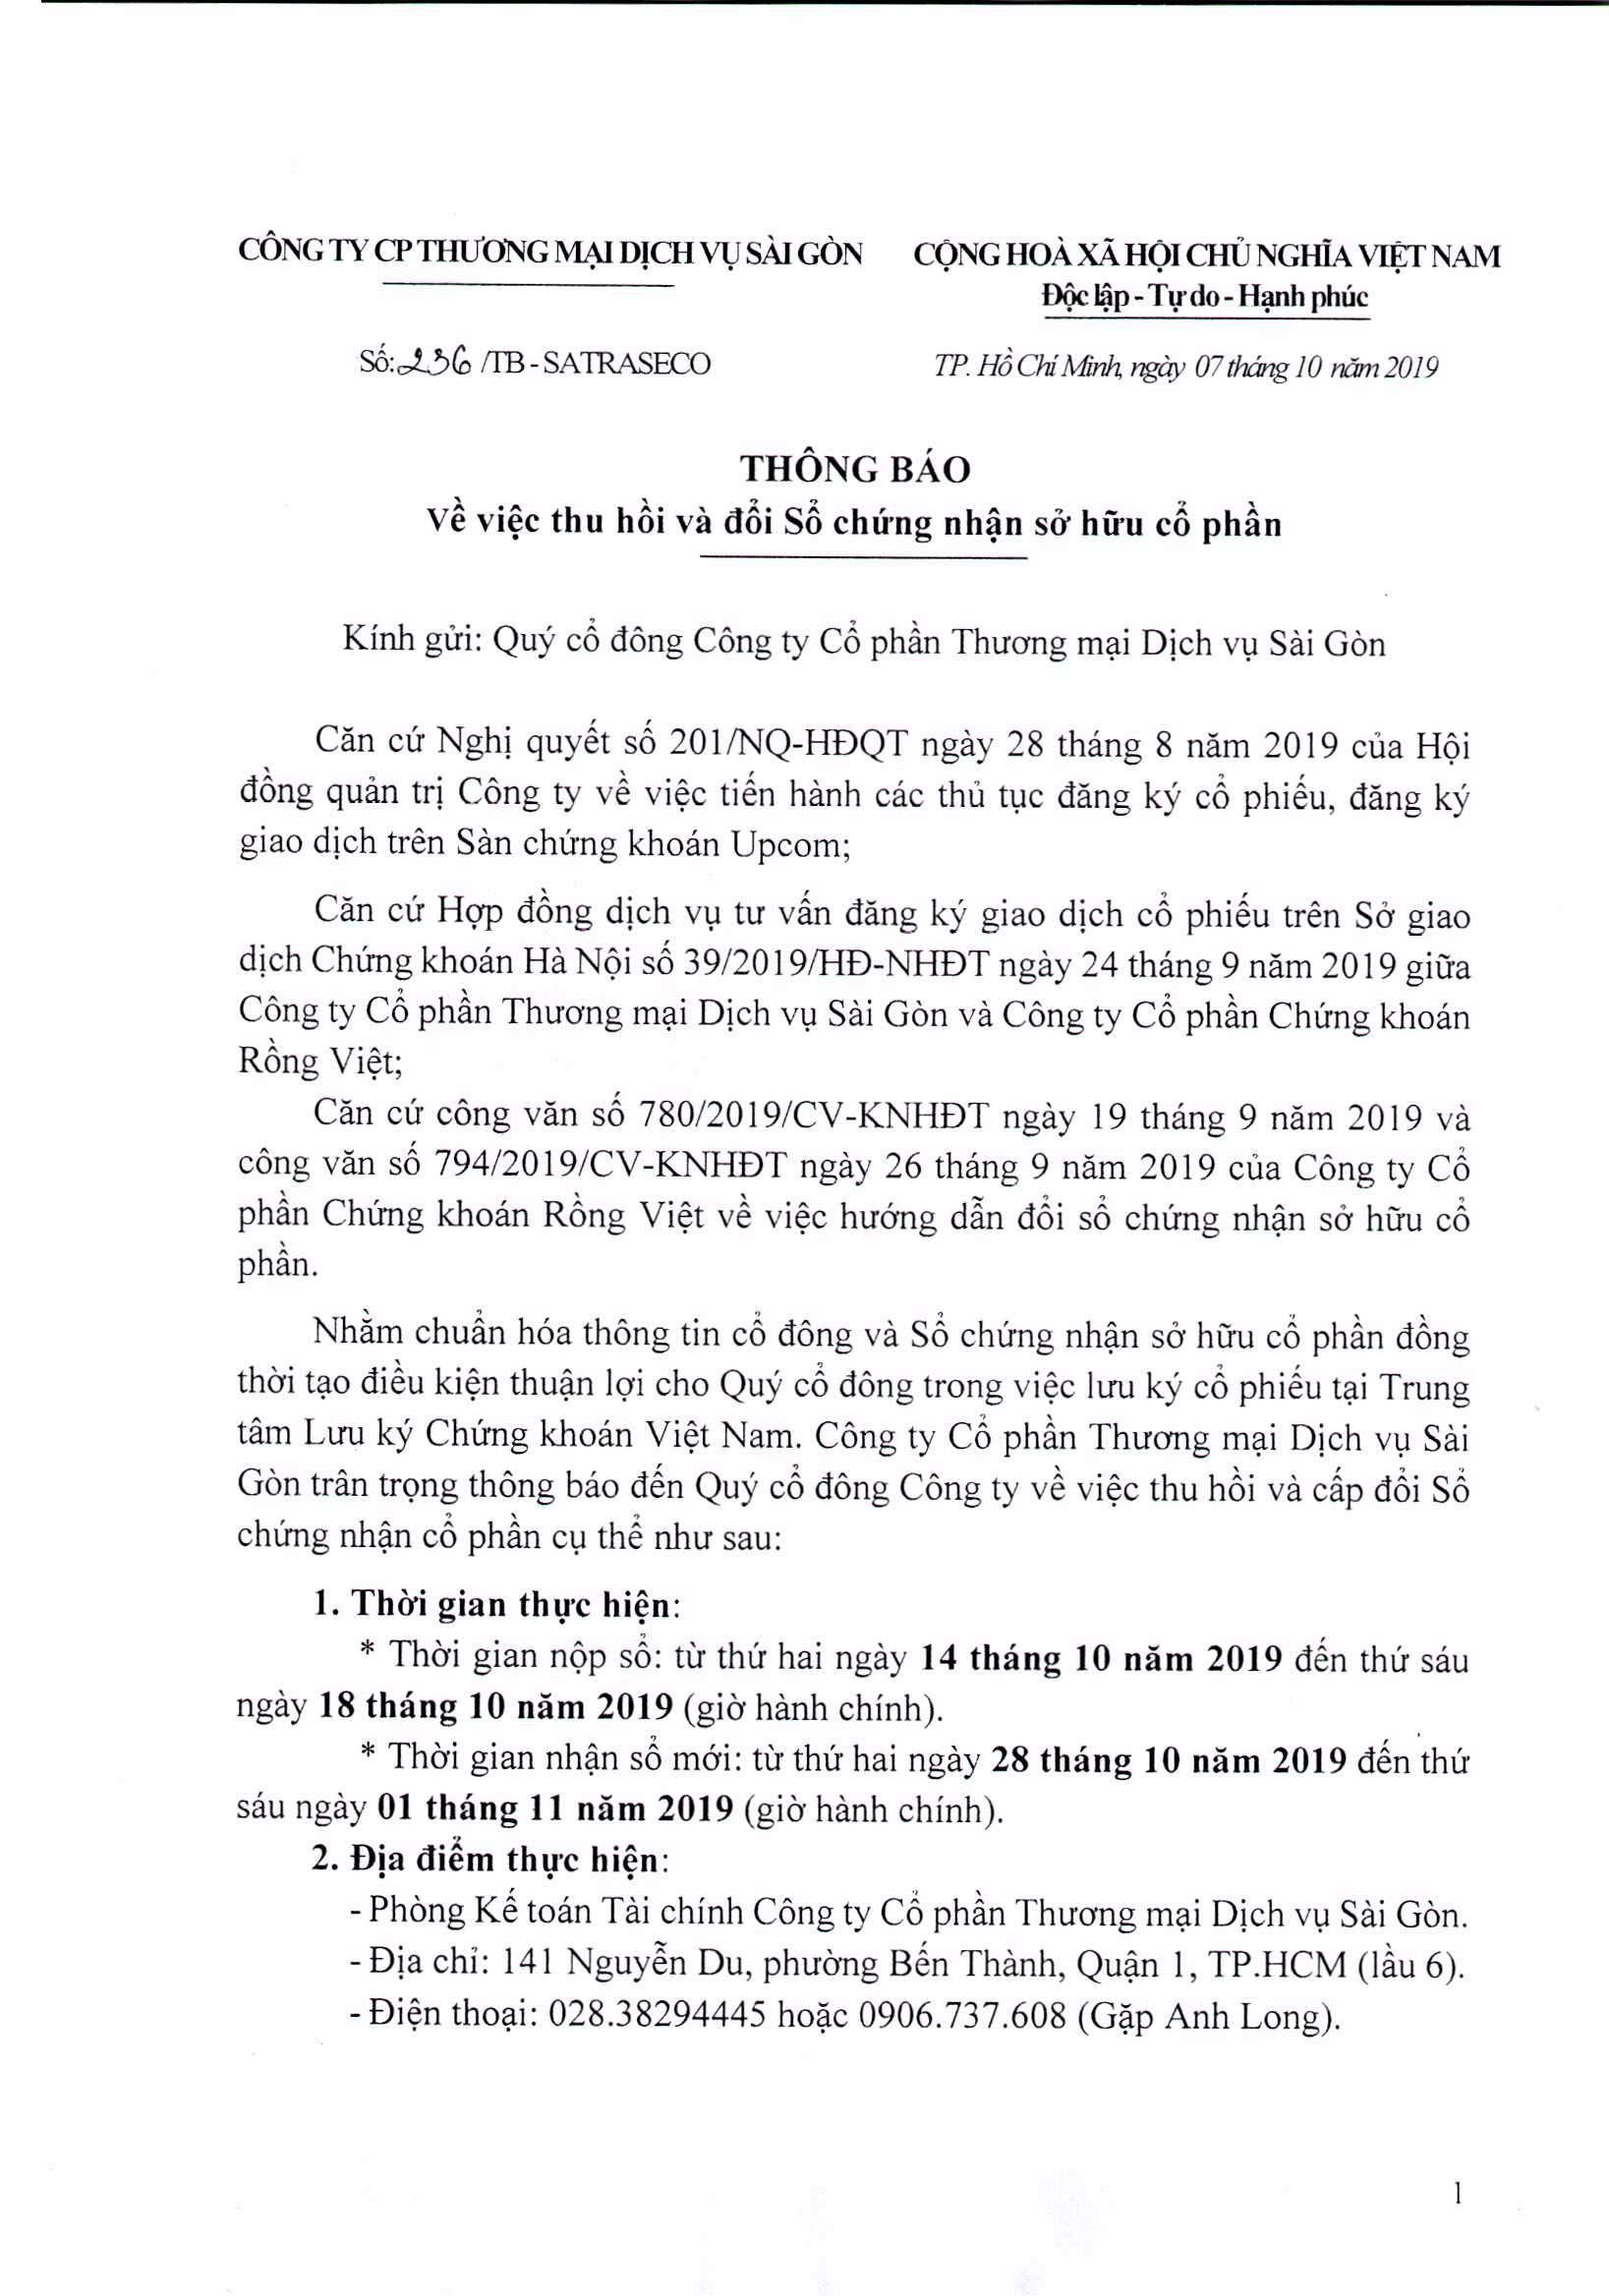 TB ve viec thu hoi va doi so chung nhan so huu co phan (1) (1)